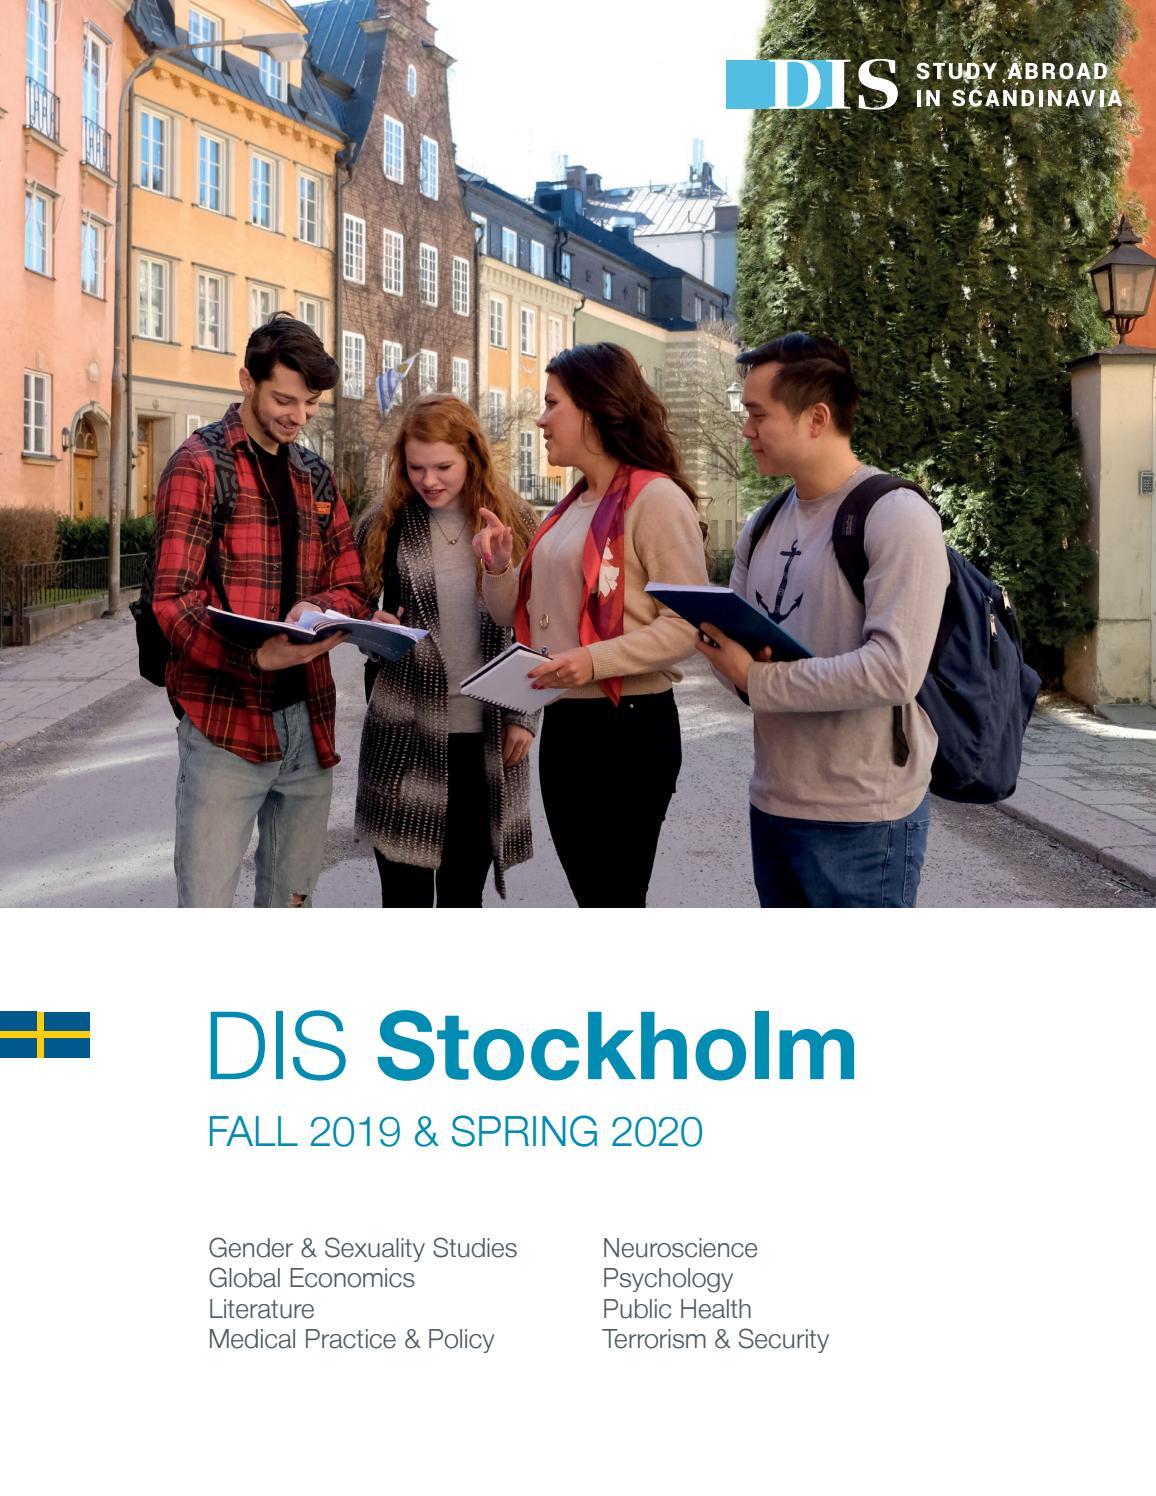 Cuny Academic Calendar Spring 2020.Dis Stockholm Semester Catalog Fall 2019 Spring 2020 By Dis